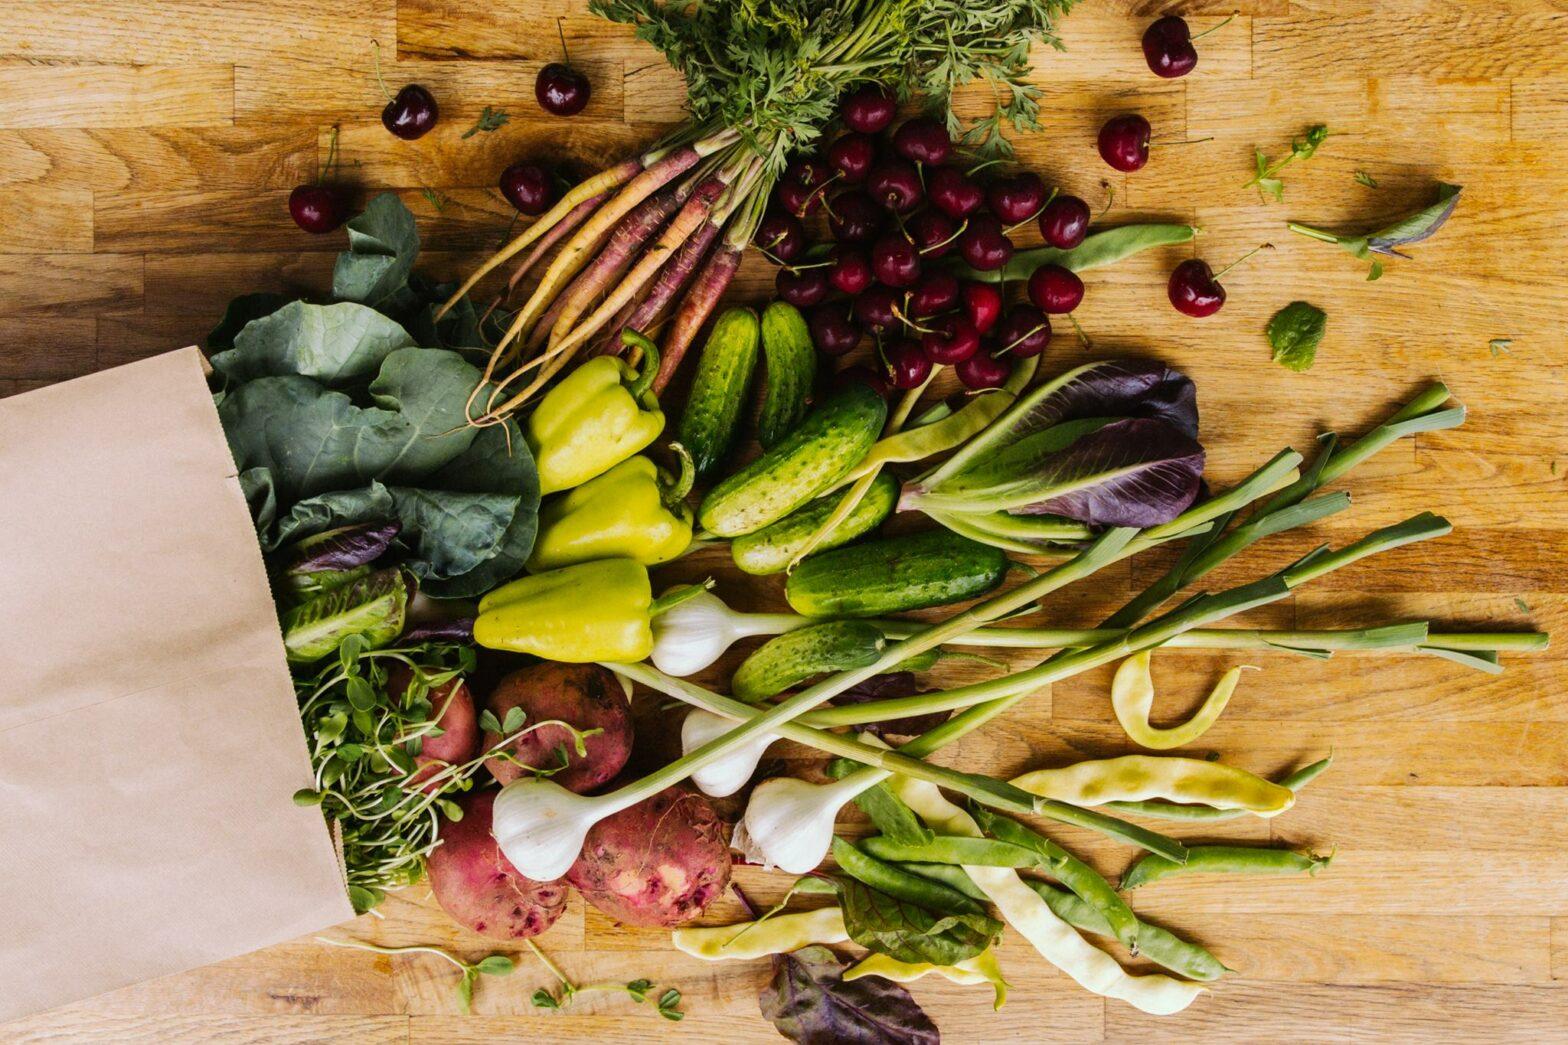 harvest foods, ecoluxluv, ecoluxlifestyle, vancouver, bc, vancity, bc, lifestyle, west coast